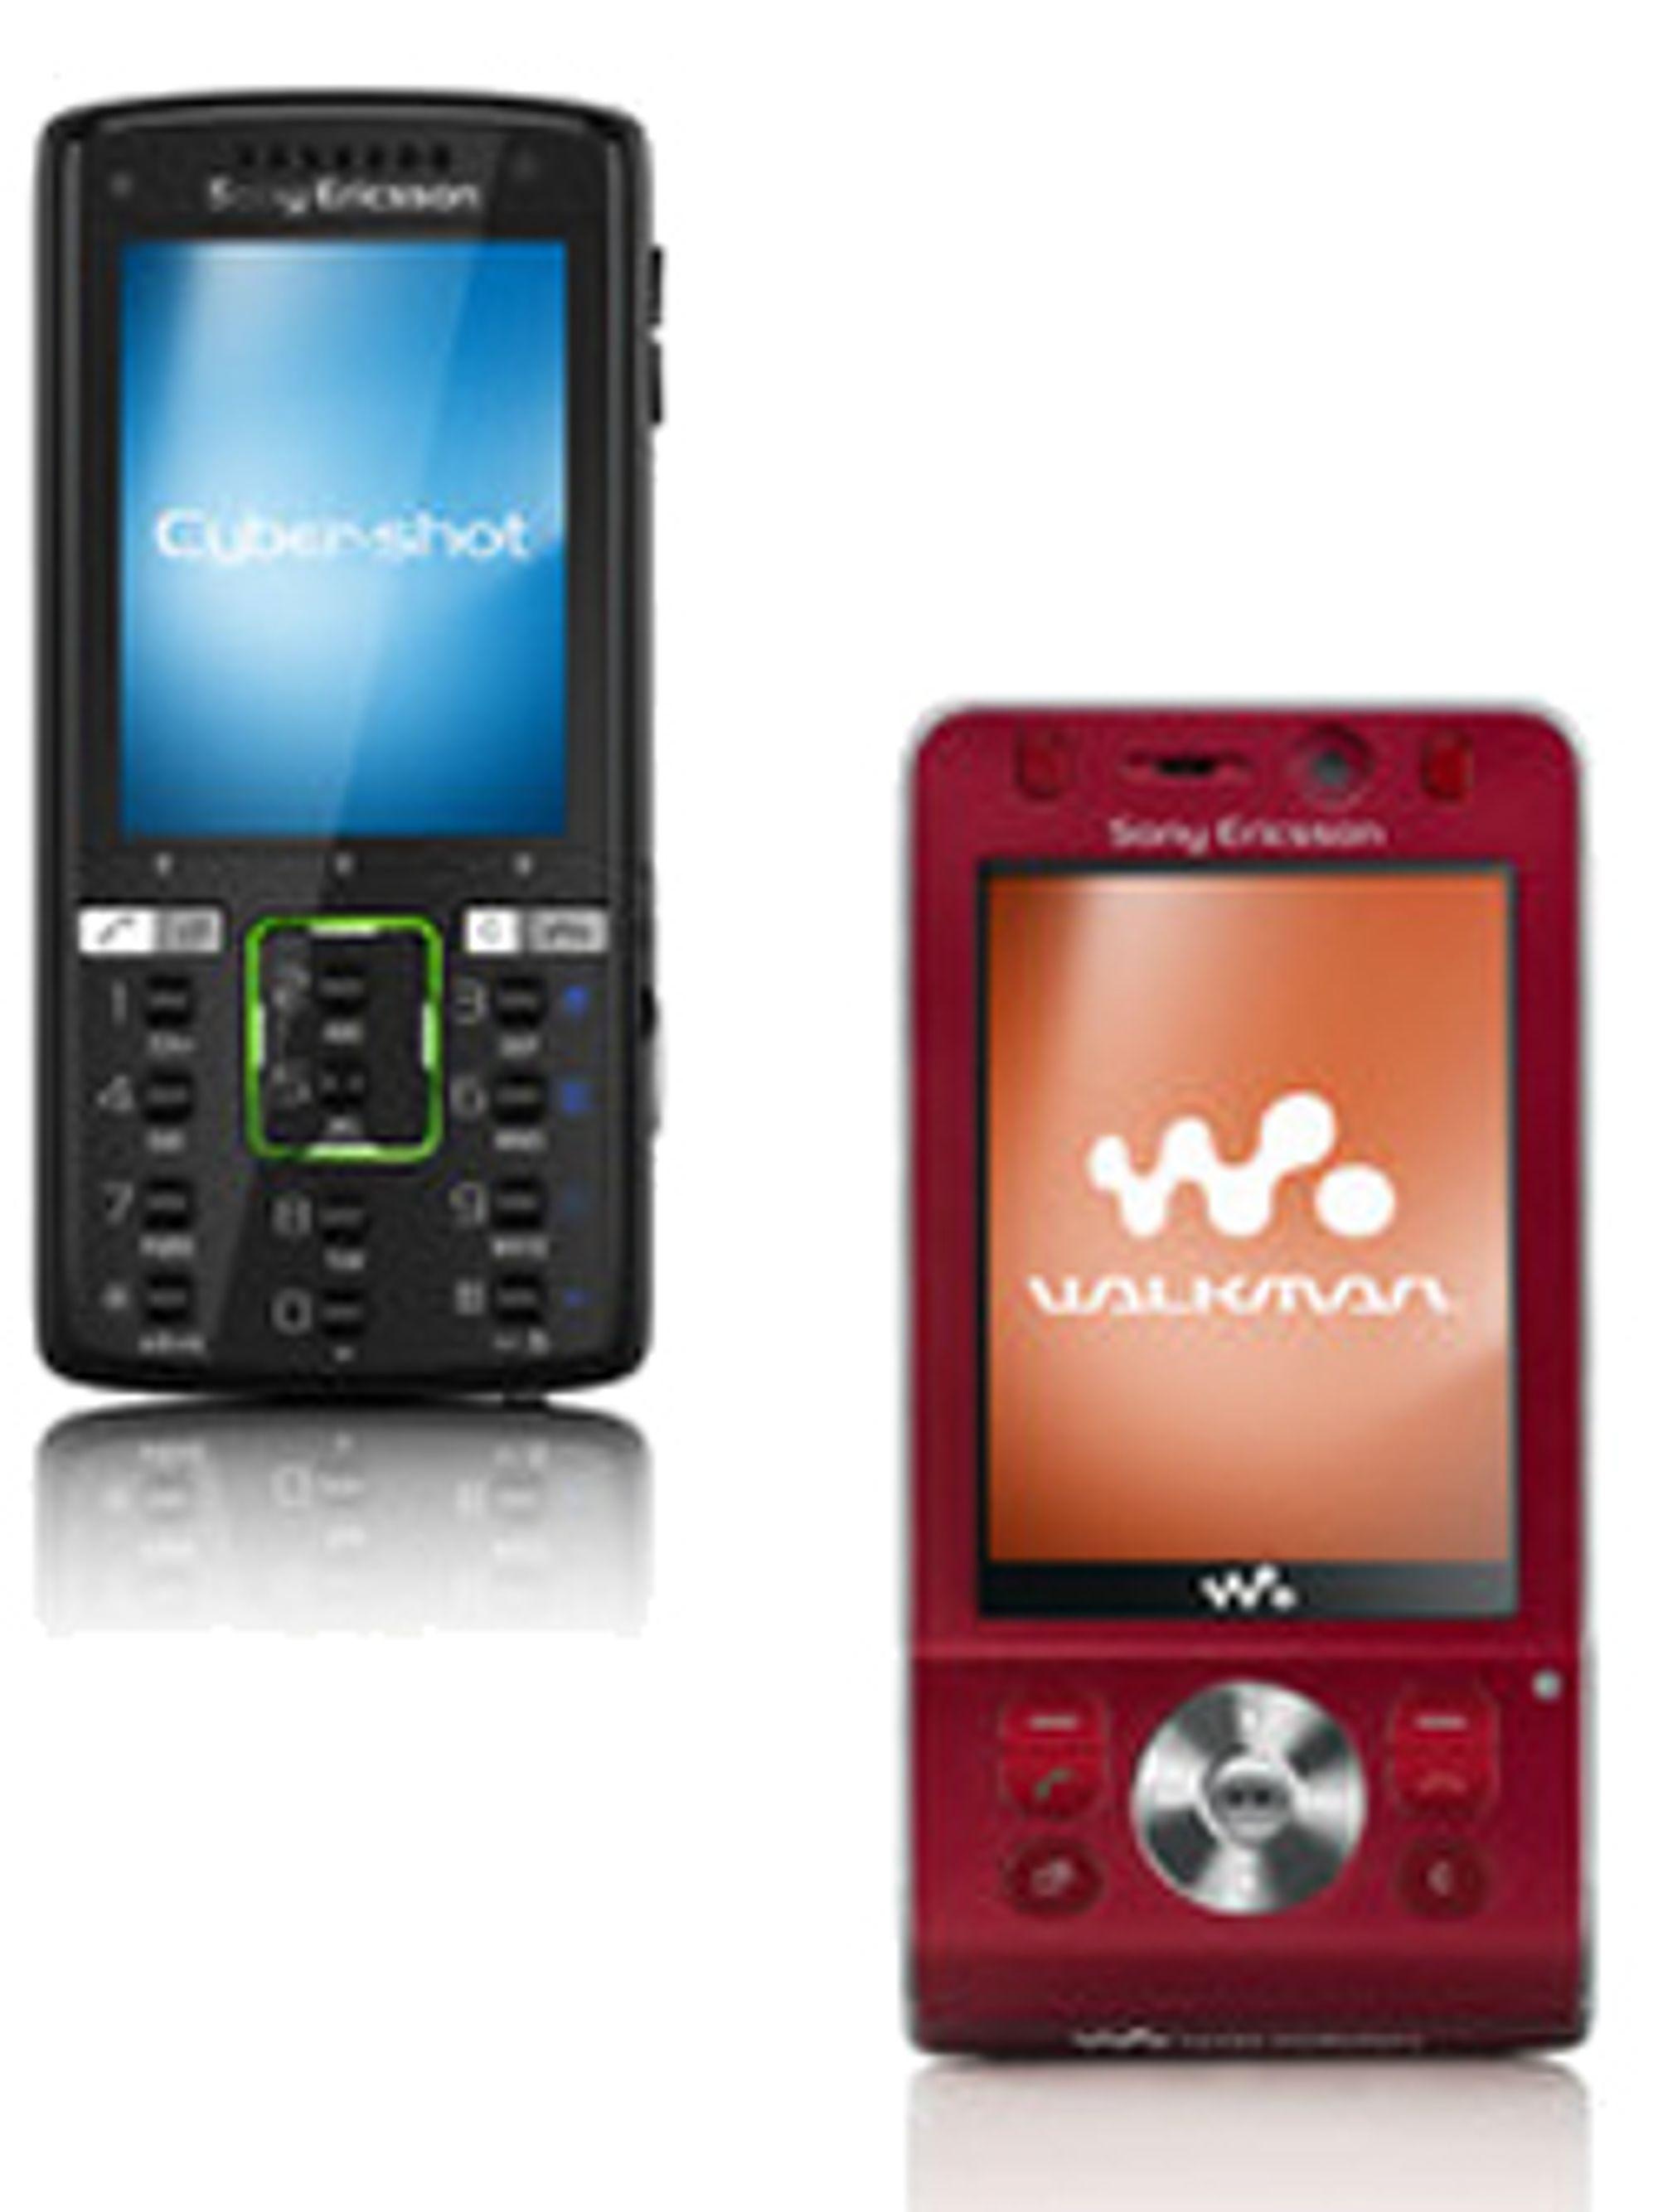 K850i (til venstre) og W910i er to super-3G-mobiler som kommer fra Sony Ericsson denne måneden.